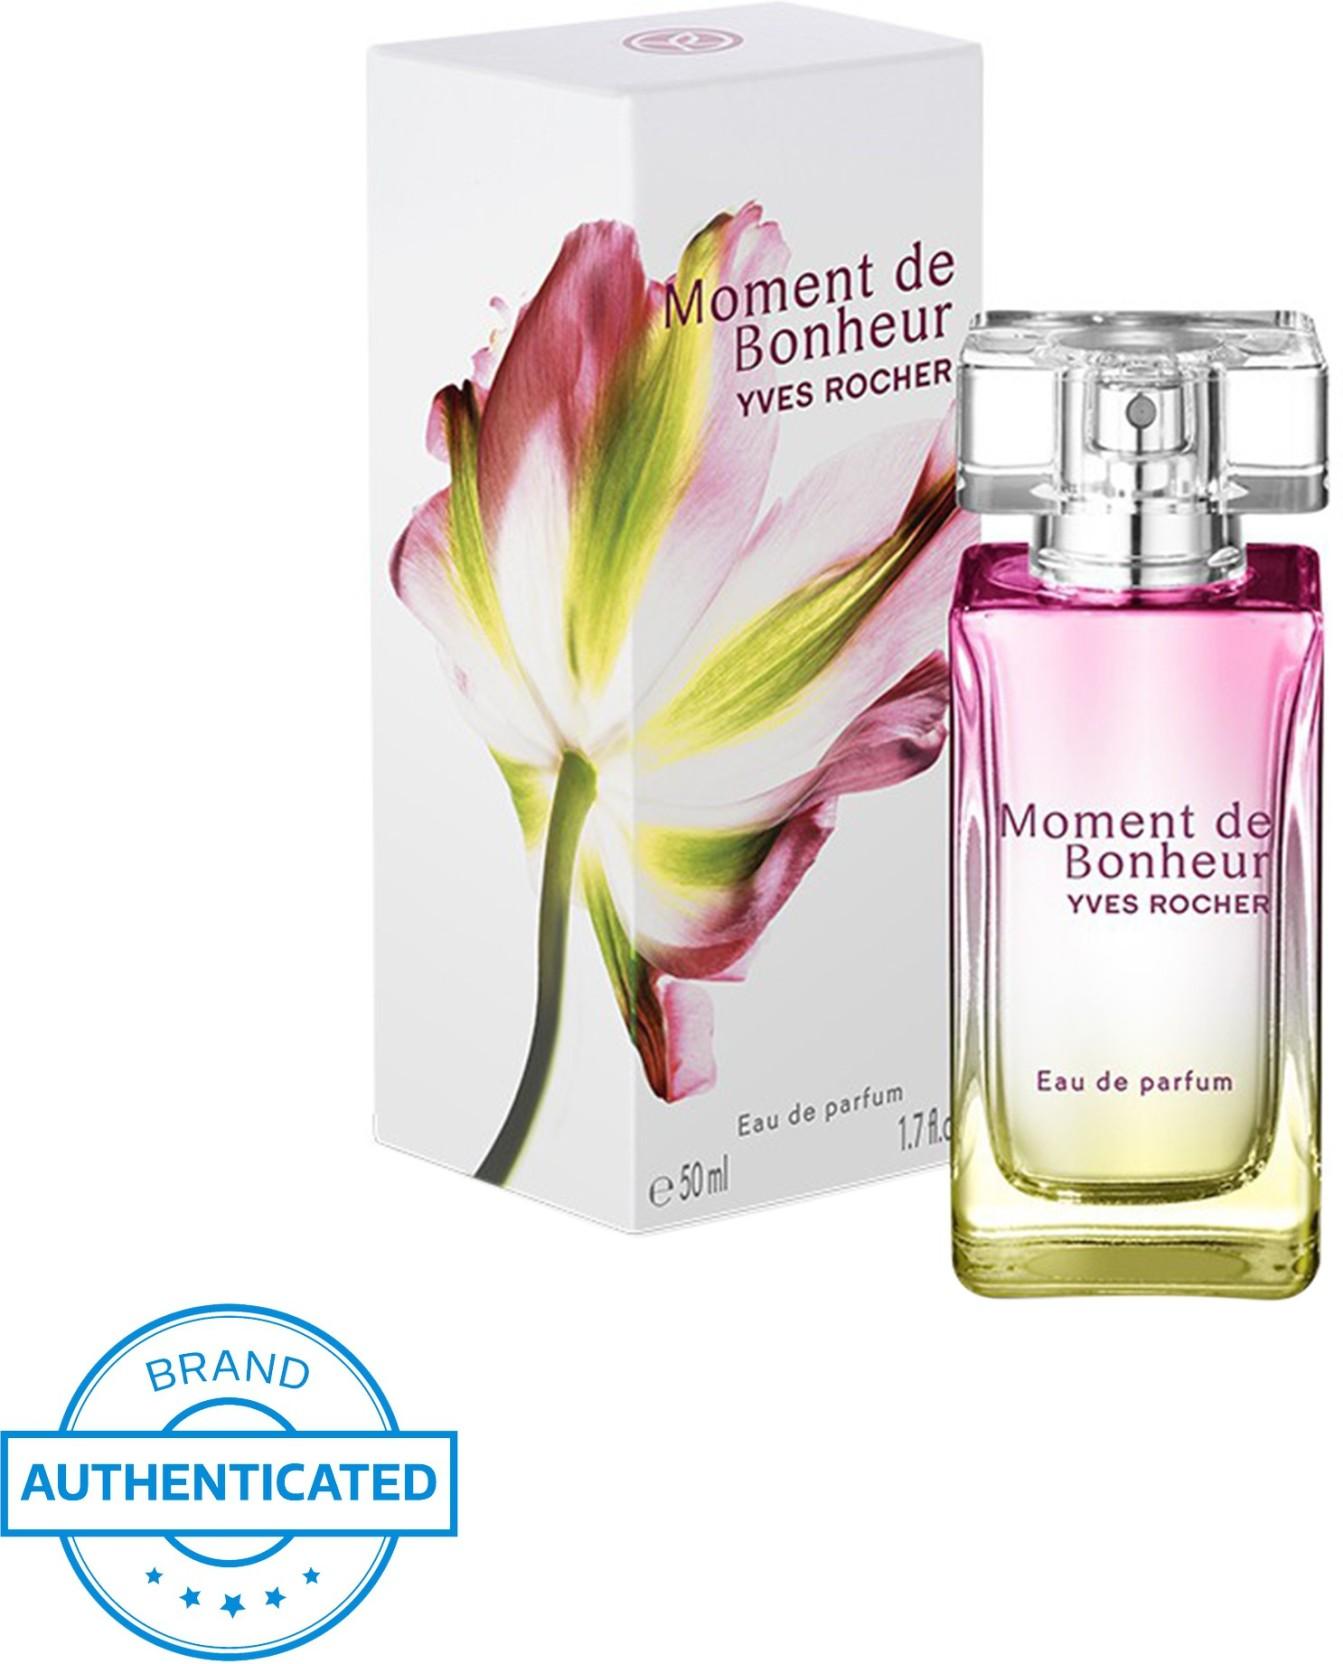 Rocher Online Parfum De Ml 50 Moment Buy Yves Eau In Bonheur MUzpLVGqSj